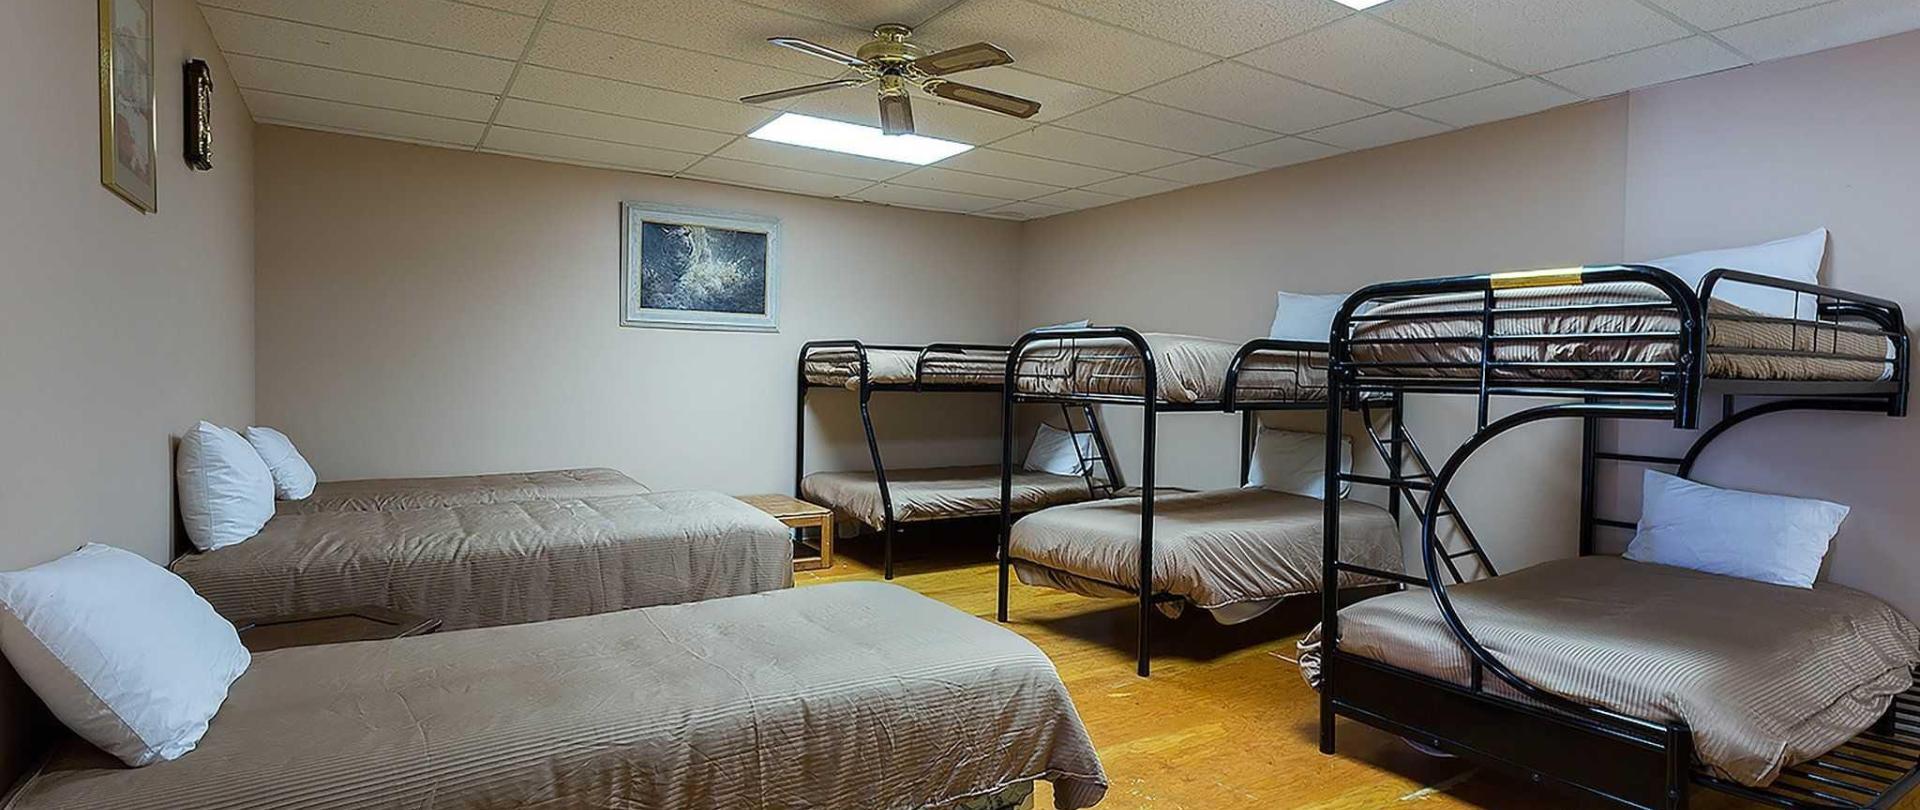 dorm-room_1911.jpg